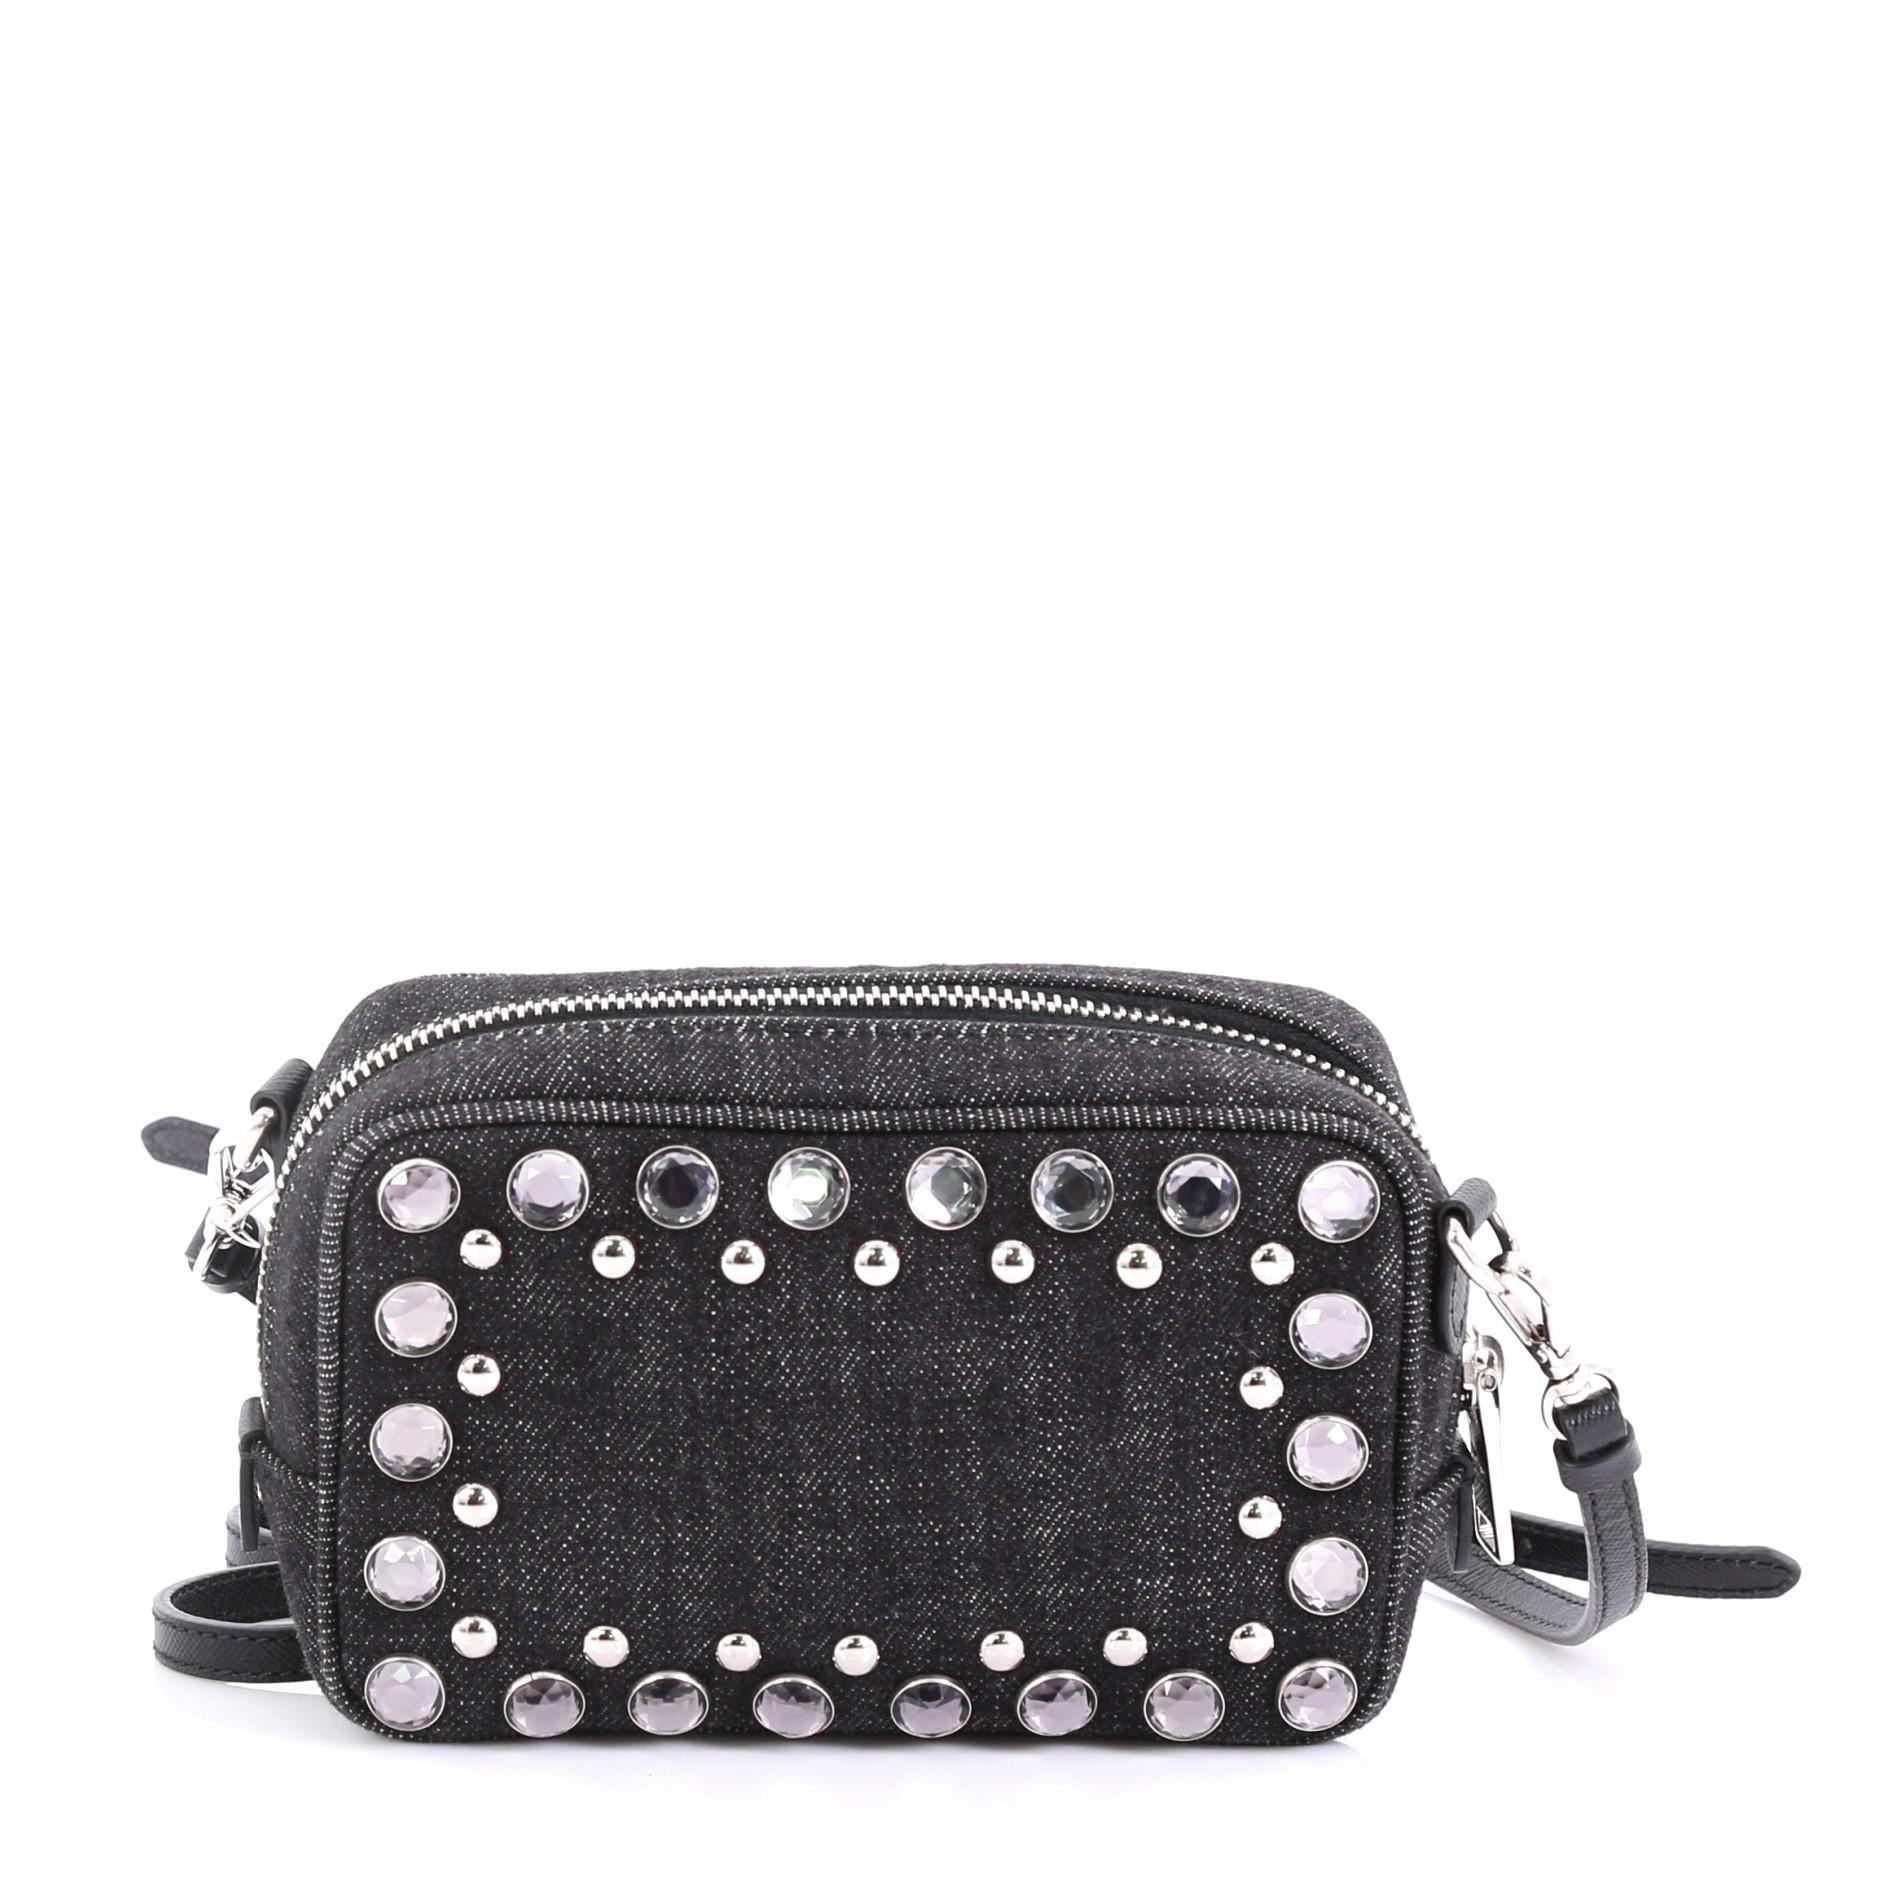 d180d939ff7c Prada Zip Crossbody Bag Rhinestone Embellished Denim Mini at 1stdibs